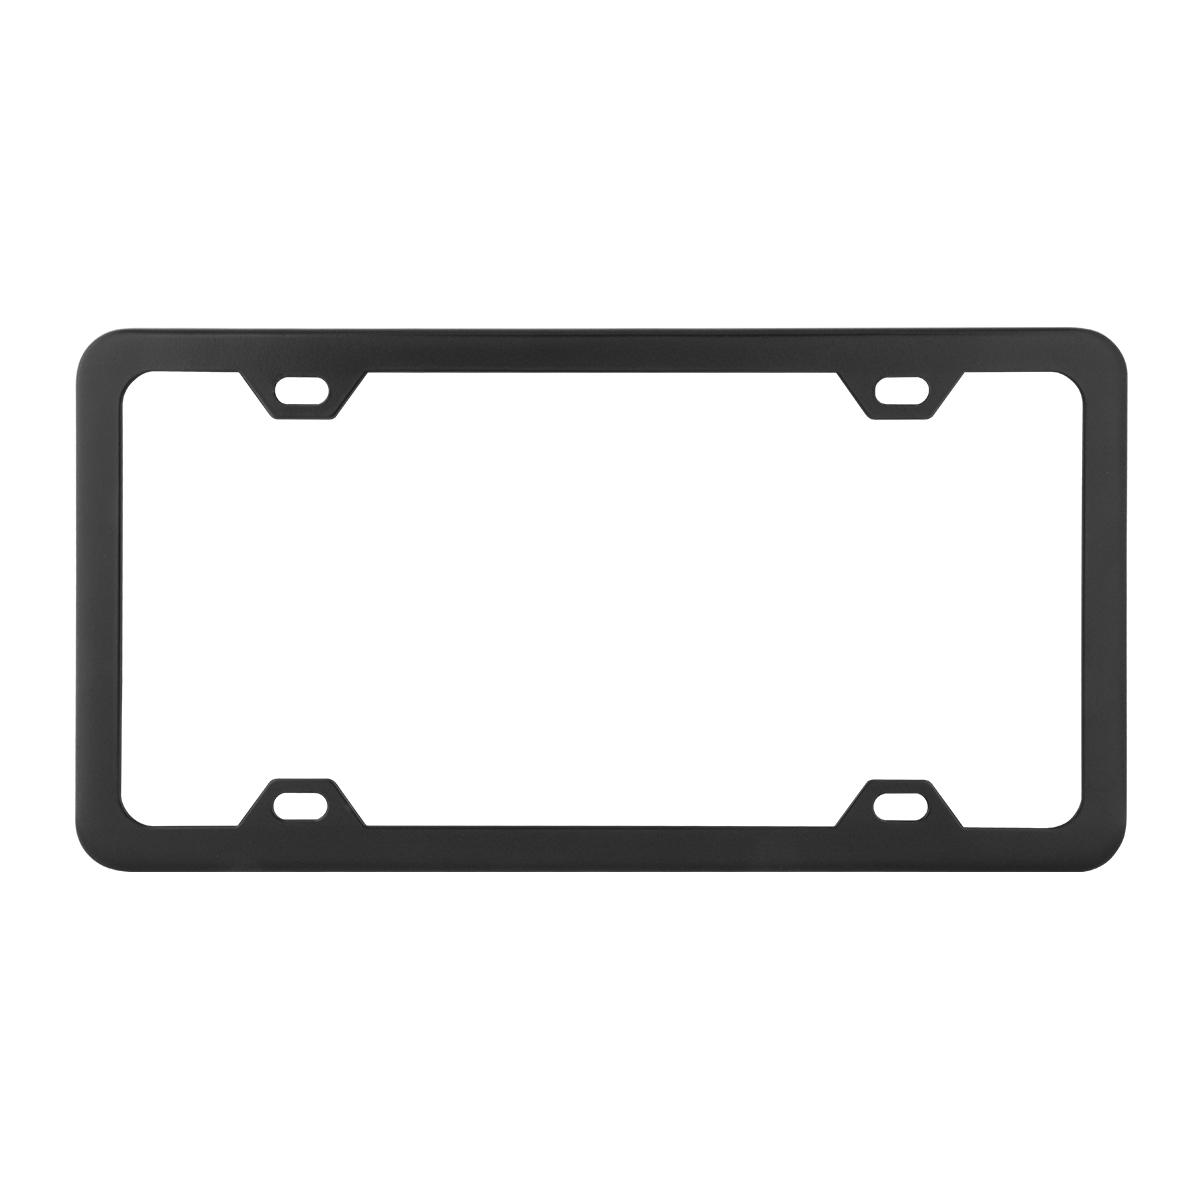 60414 Plain Matte Black 4 Hole License Plate Frame